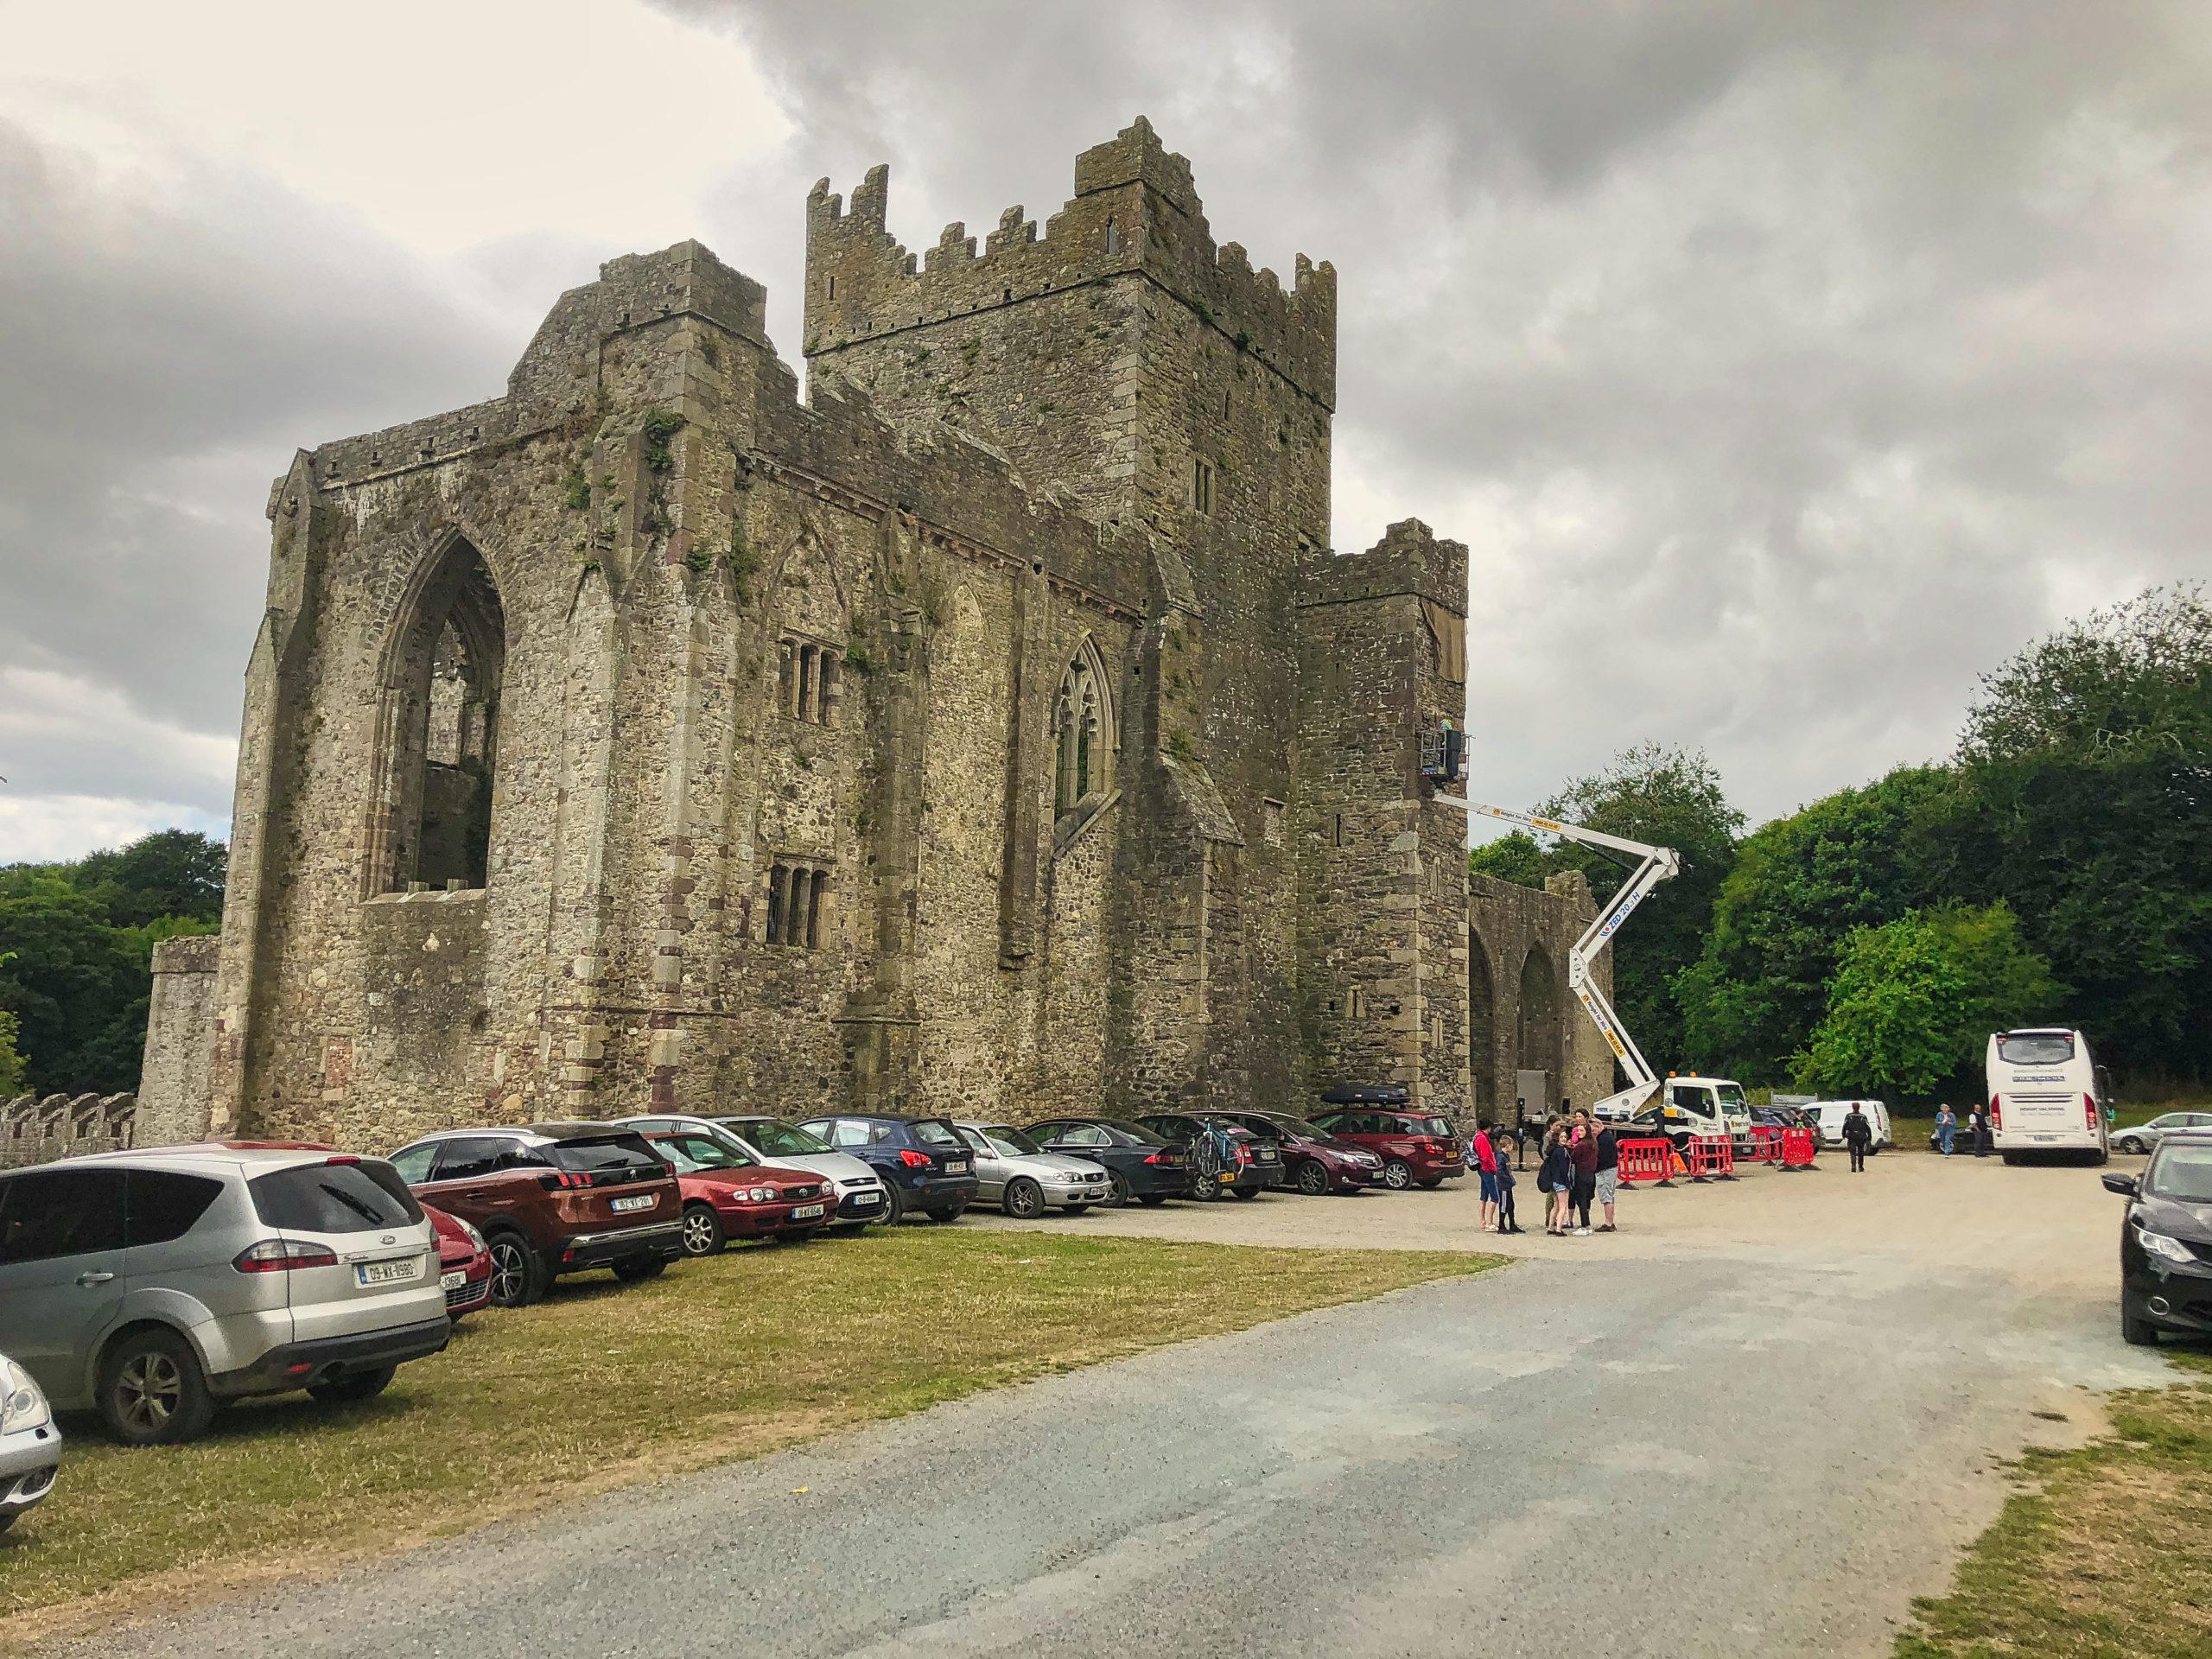 Tintern Abbey (Irland)